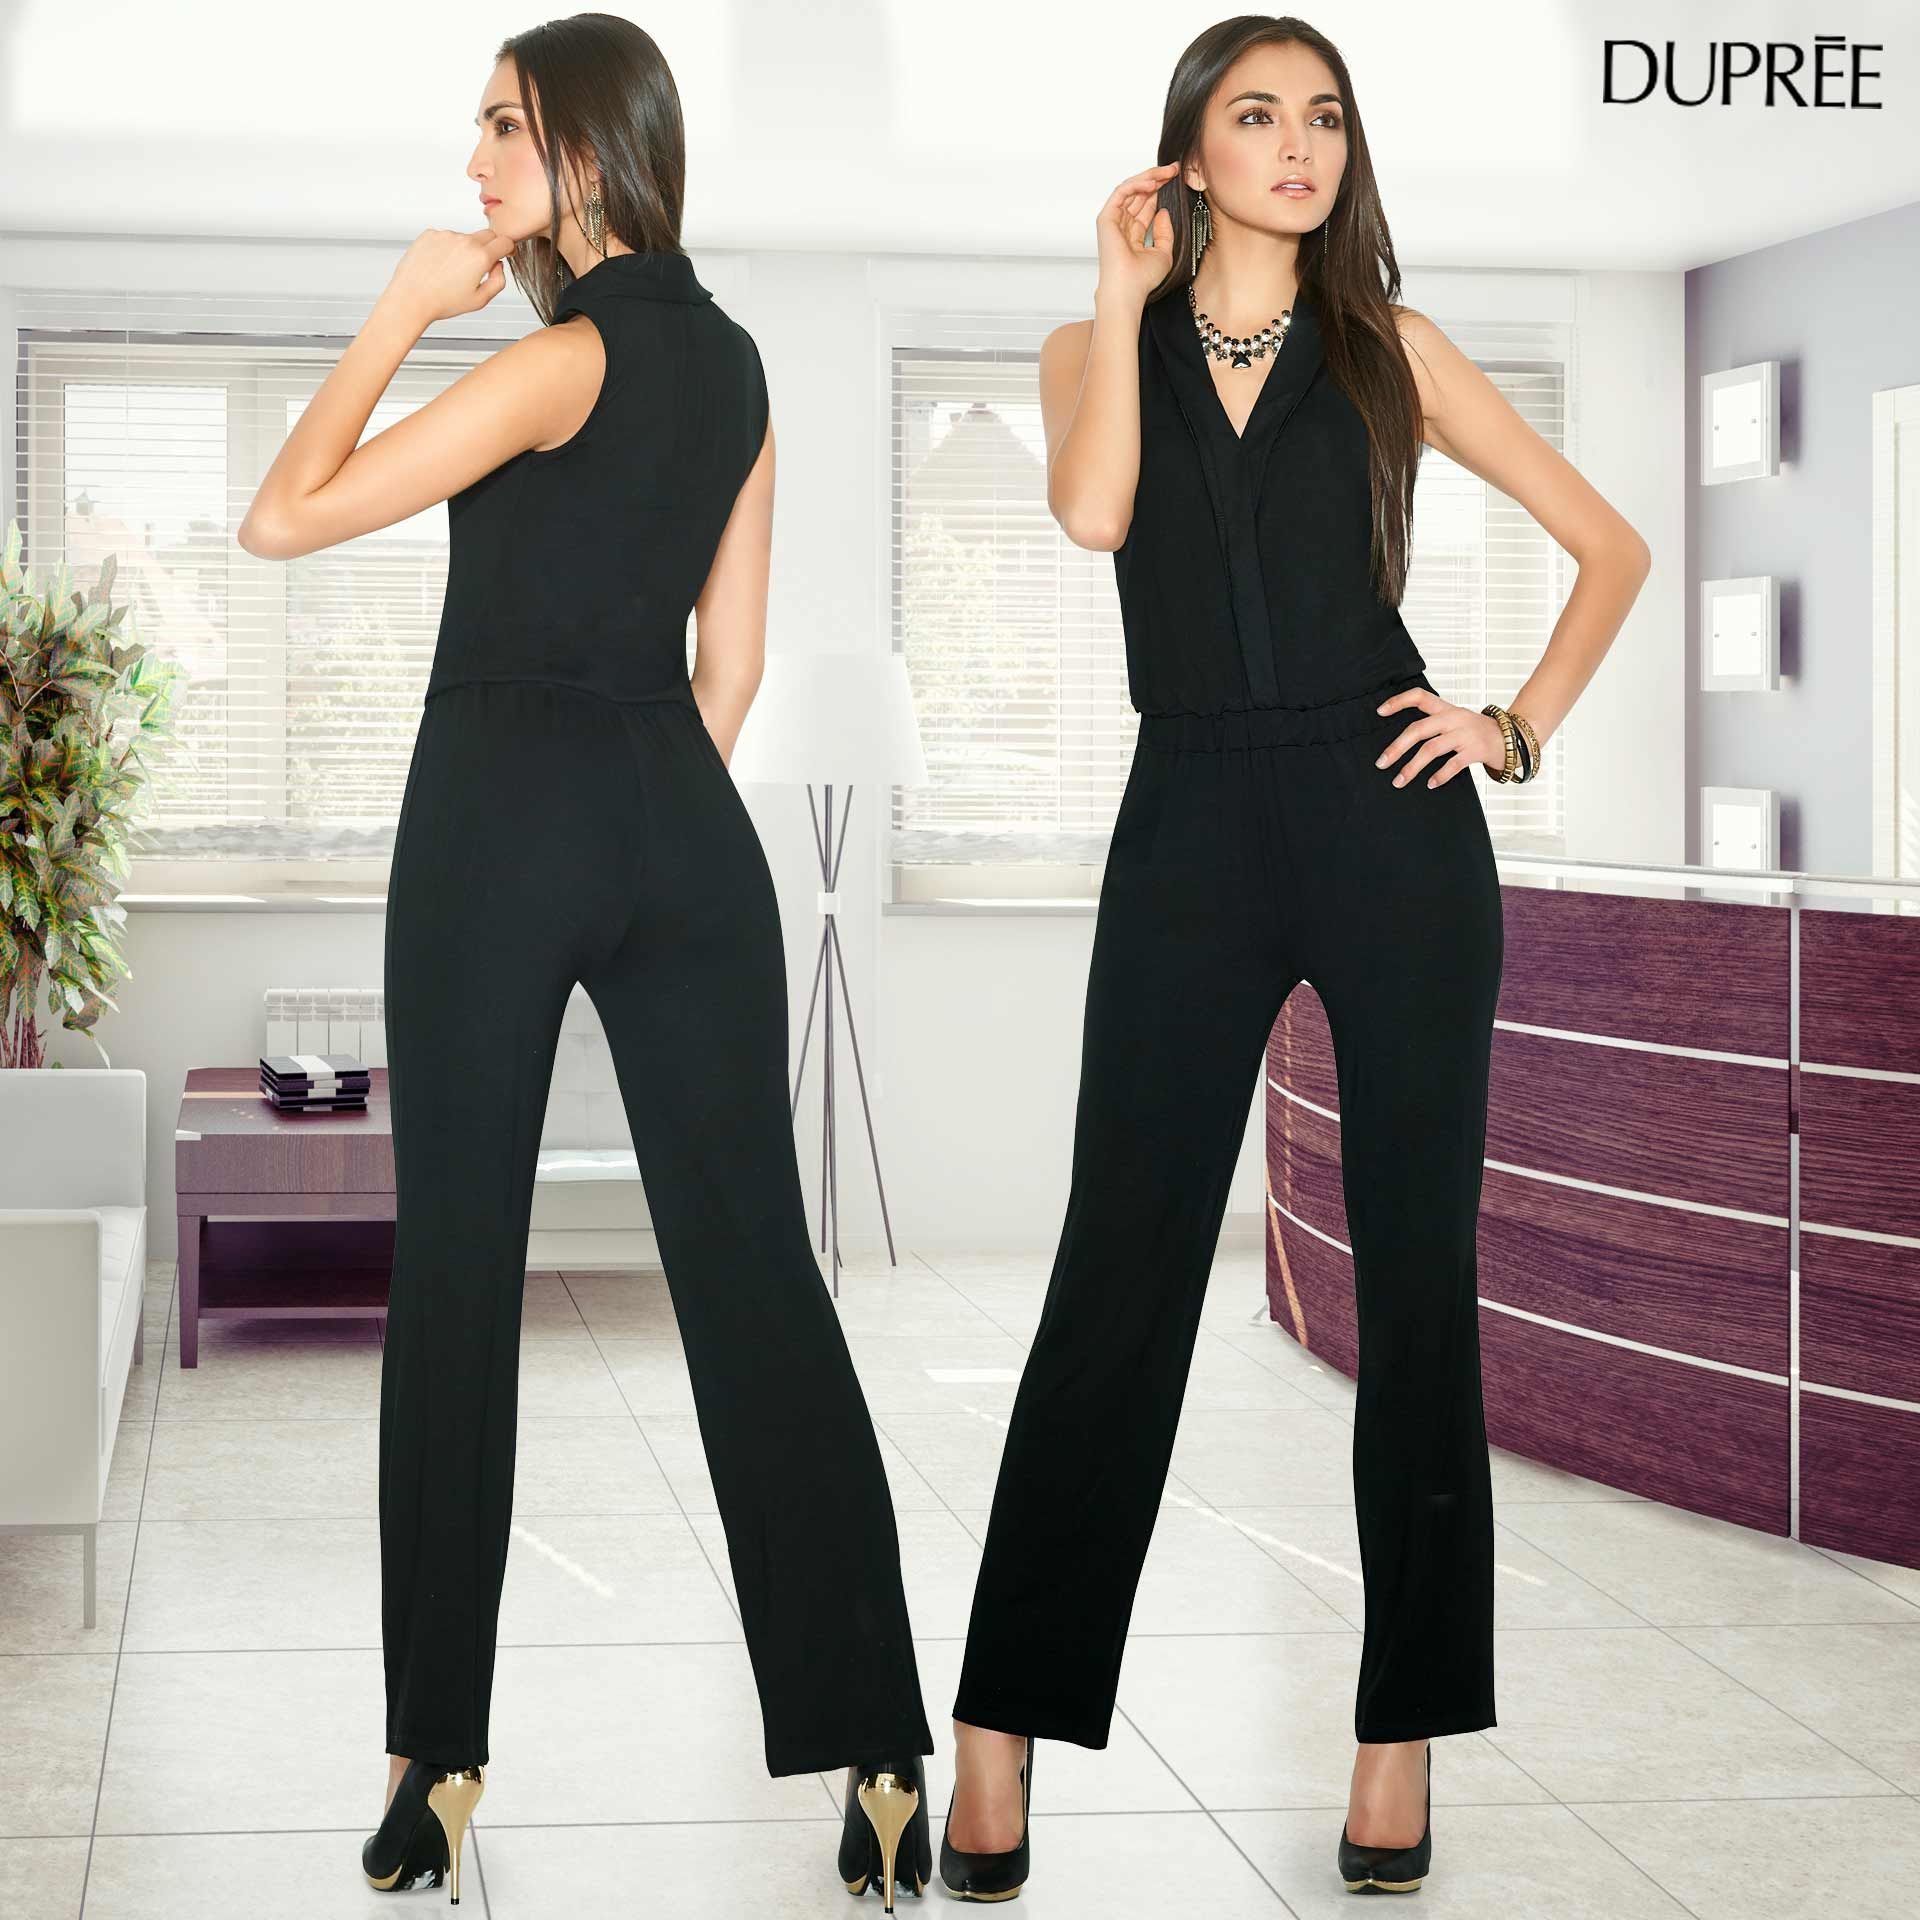 Enterizos elegantes. Moda femenina. Dupree Colombia   aurimar   Pinterest   Enterizo elegante ...